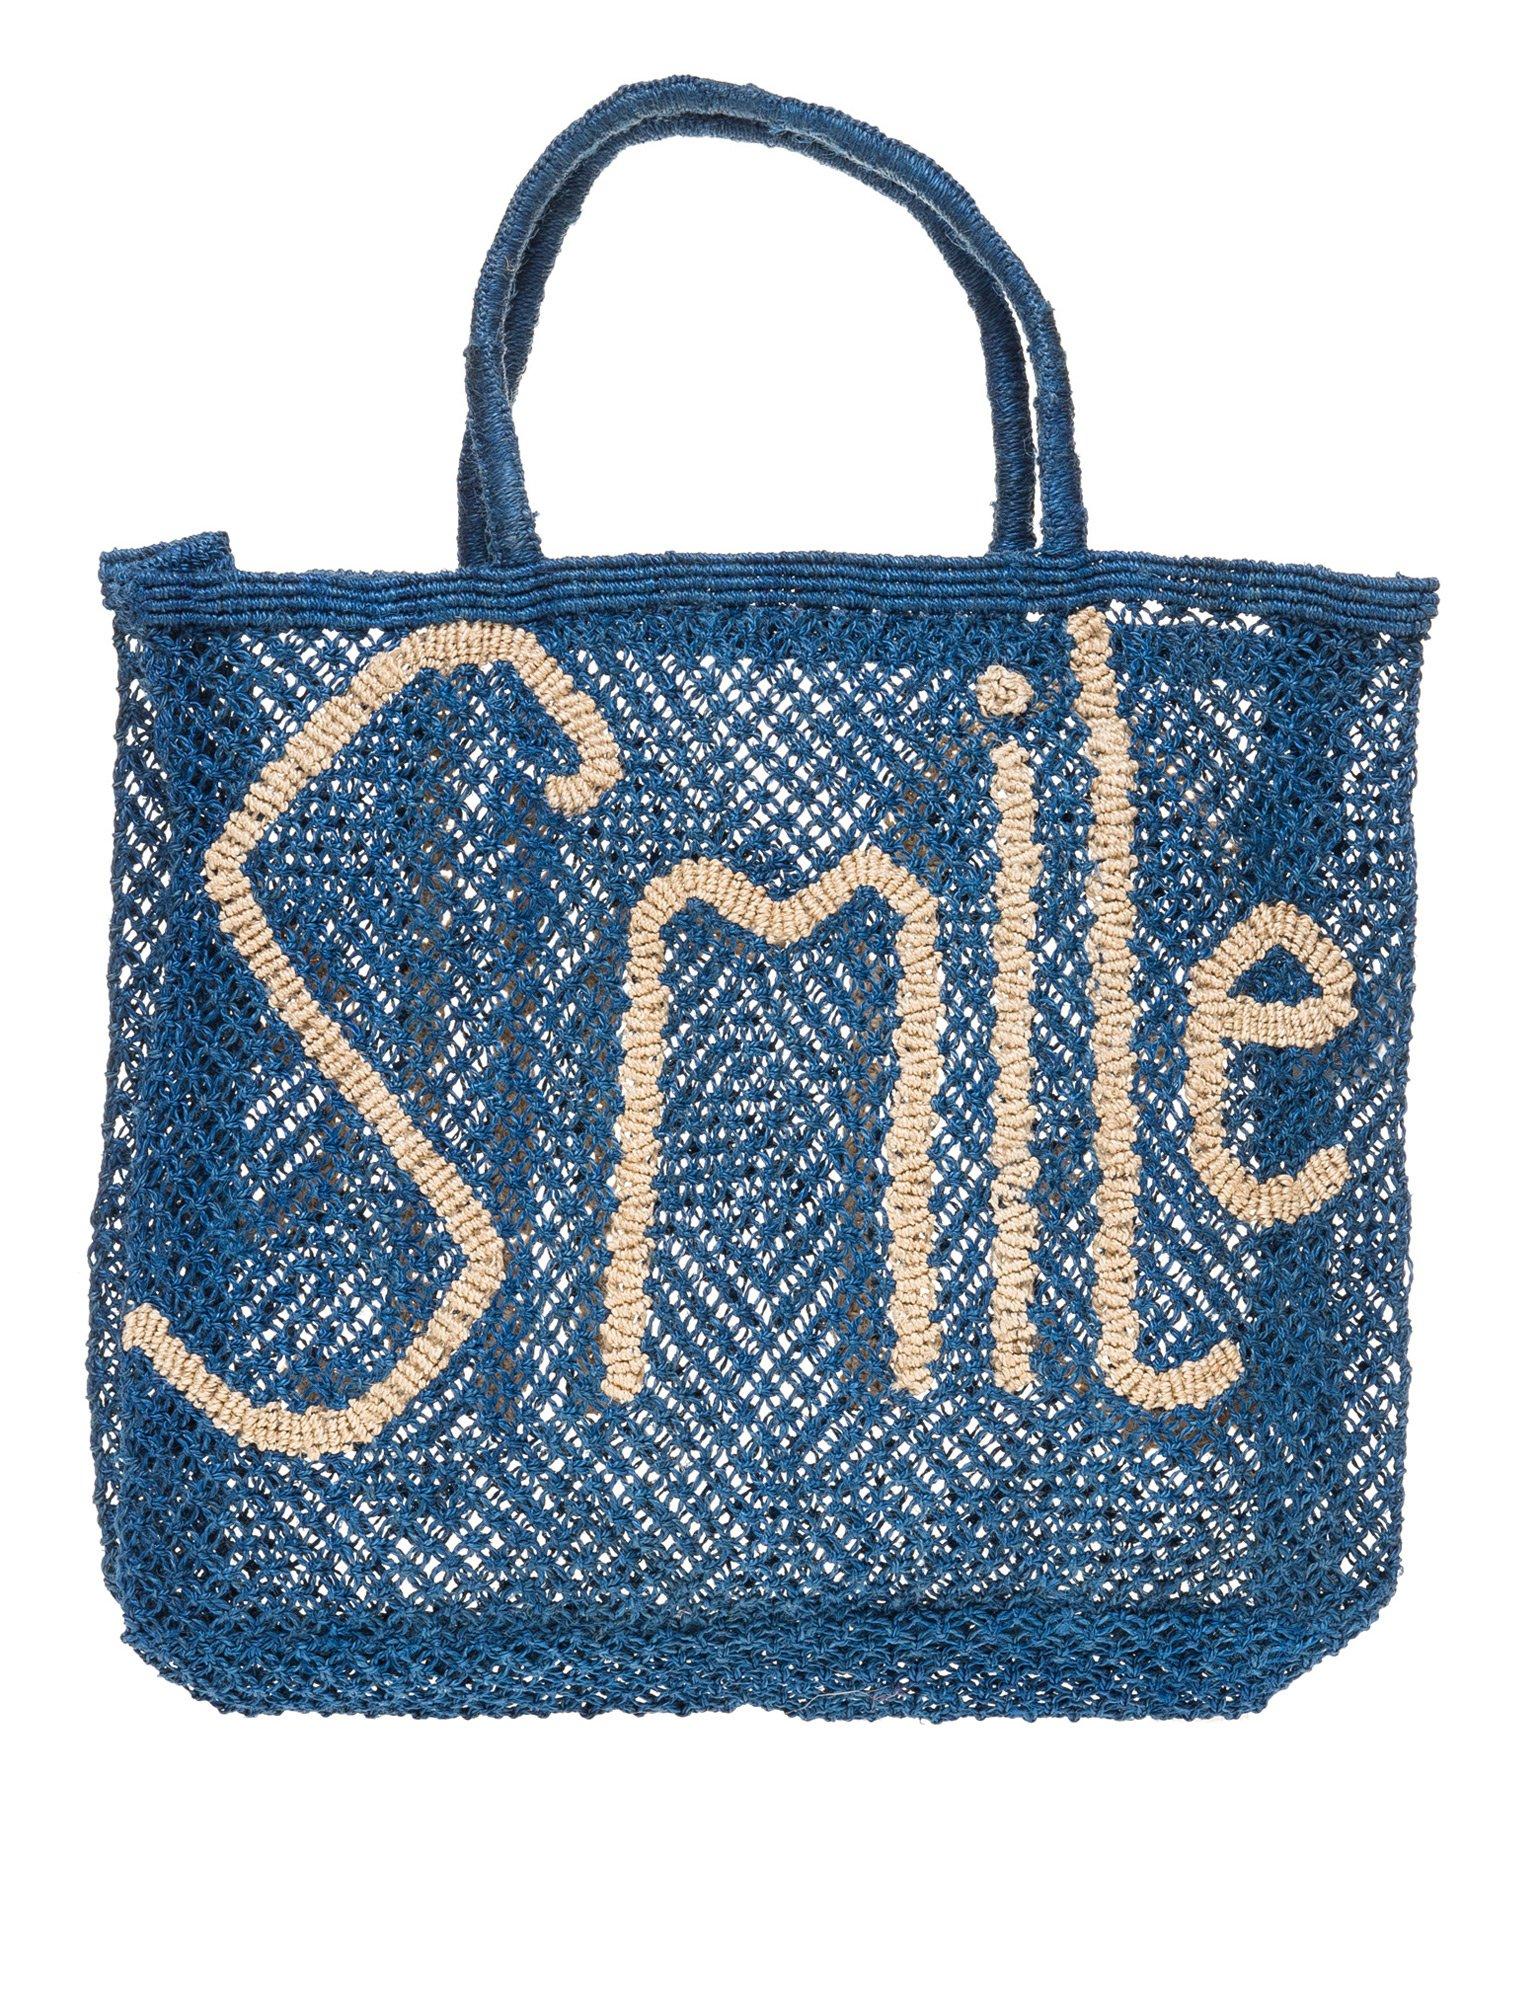 The Jacksons Women's Smile Women's Blue Large Jute Bag Blue